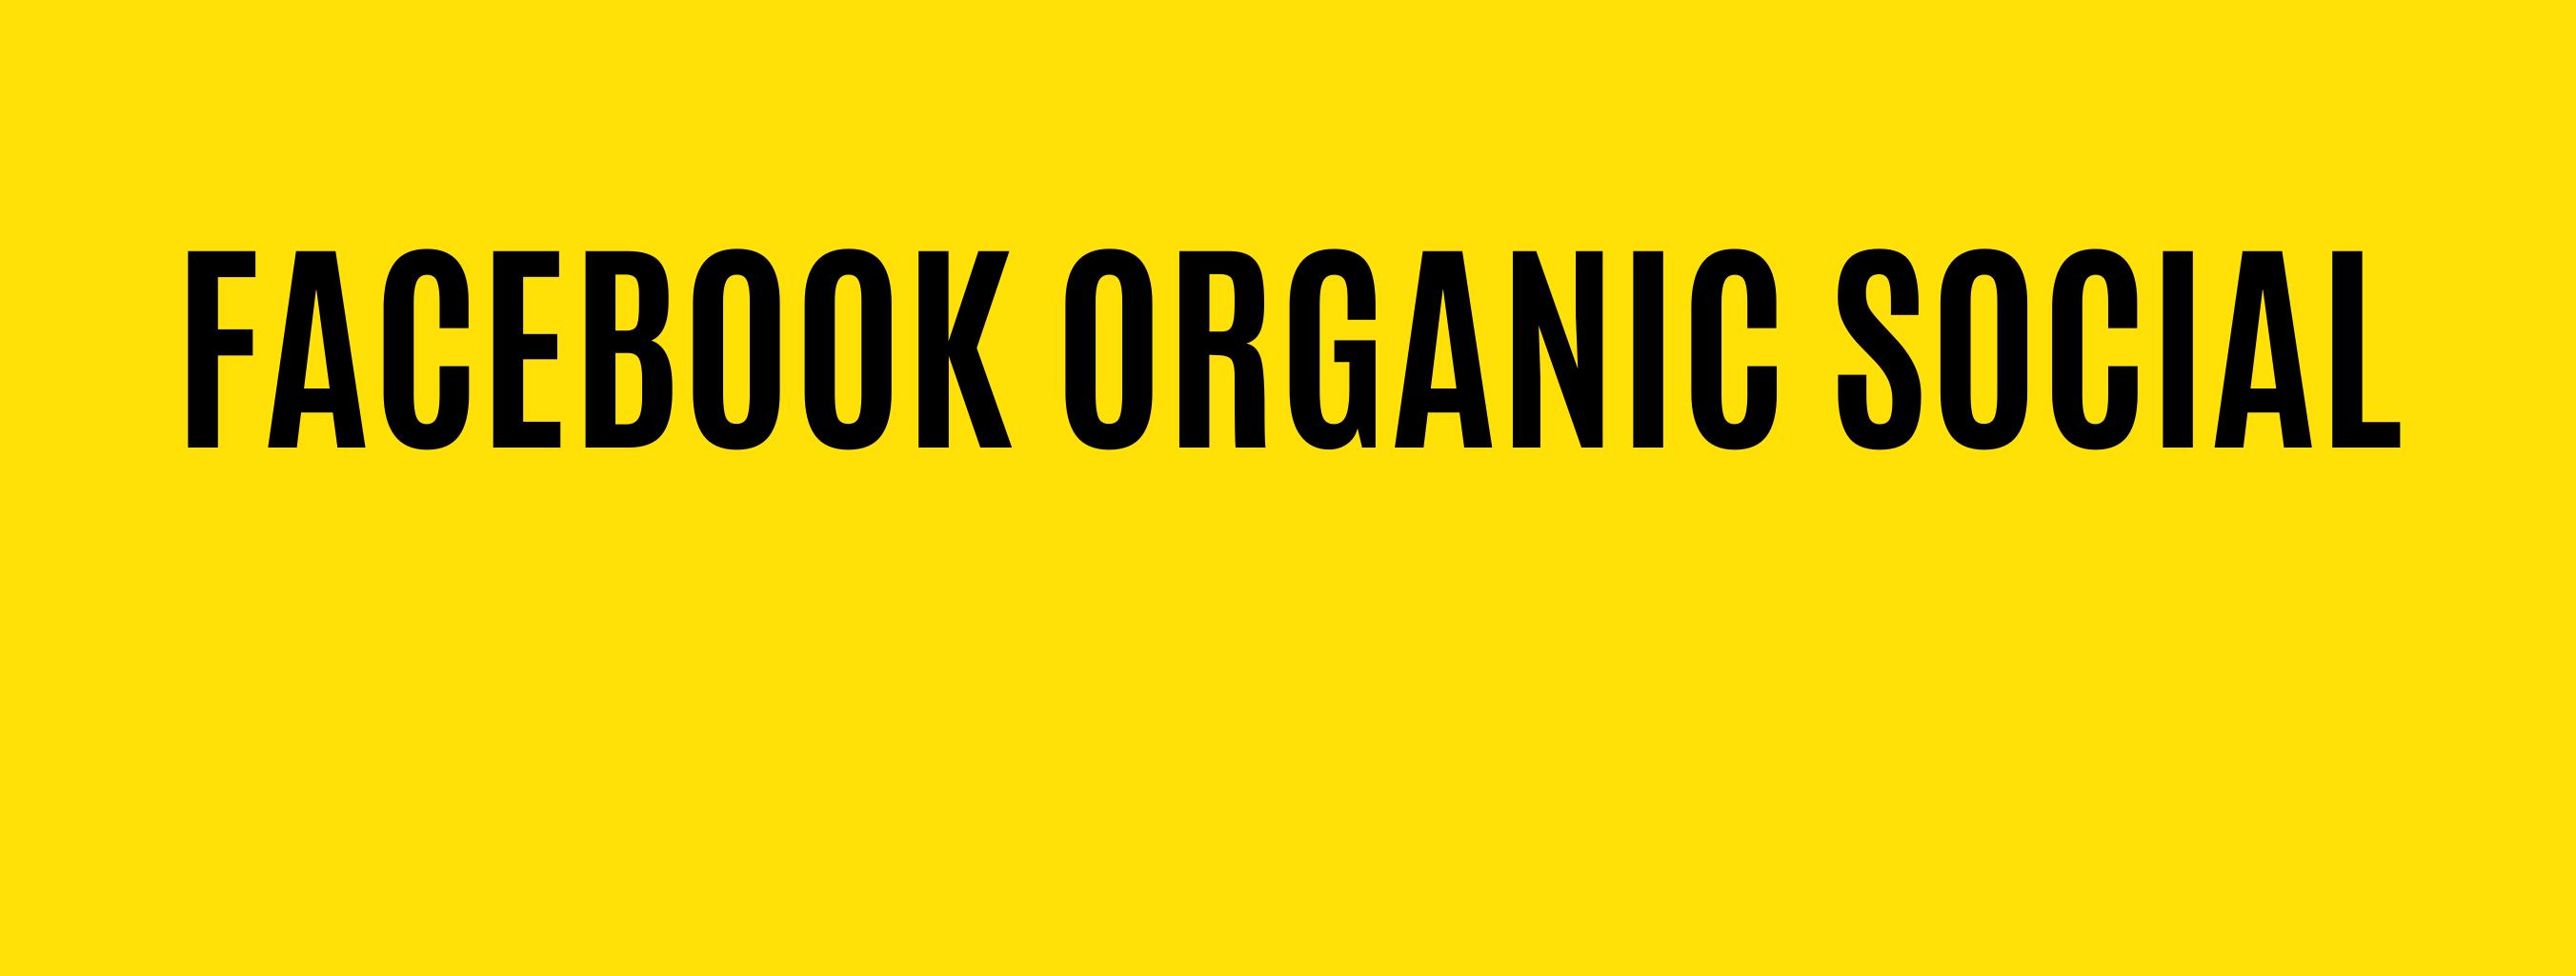 Facebook Organic Social Media Management